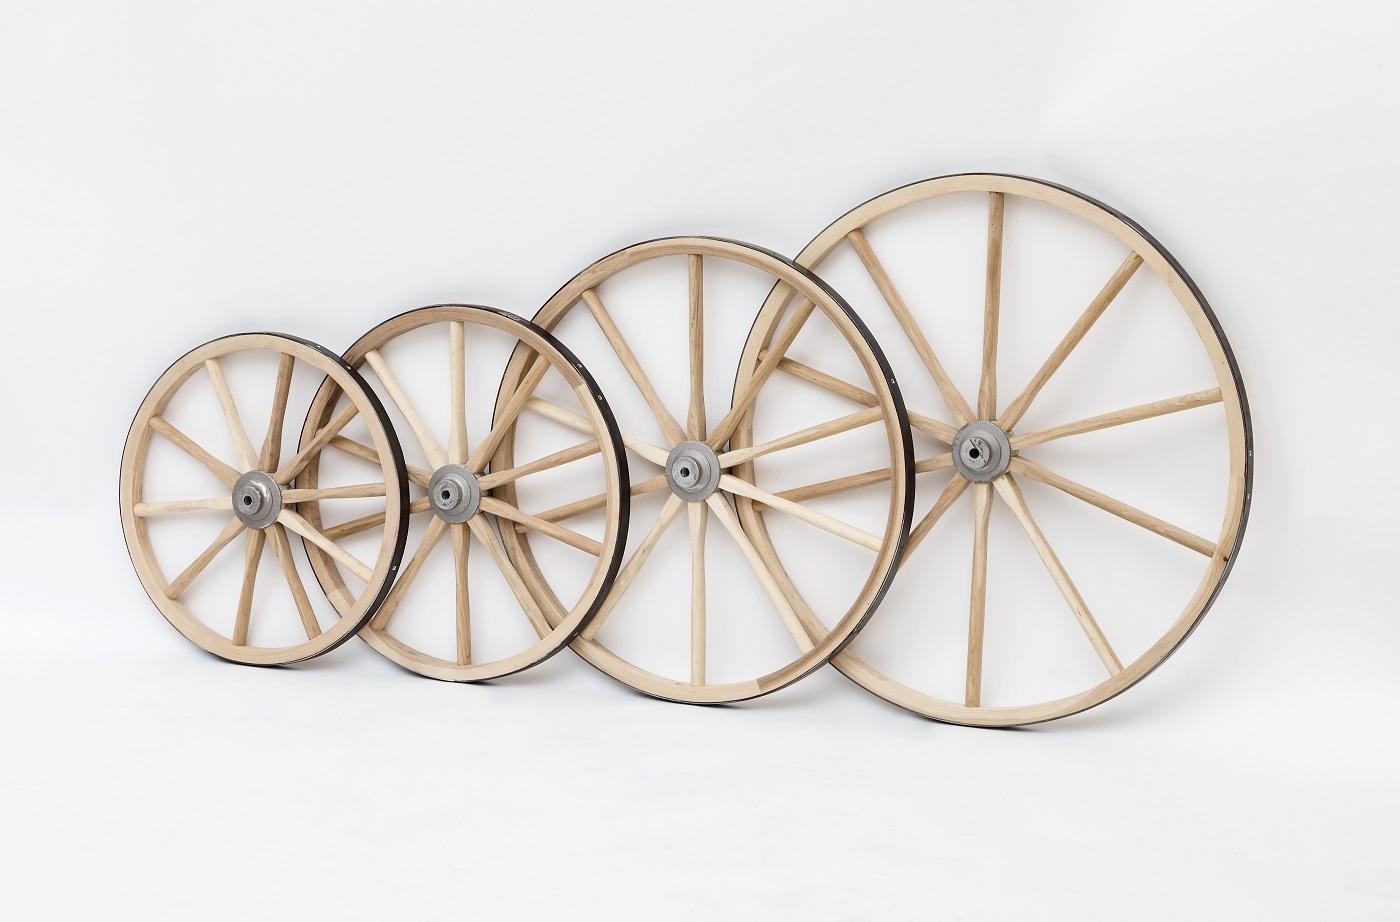 Wooden And Metal Spoked Wheels Amish Made Amishshopcom